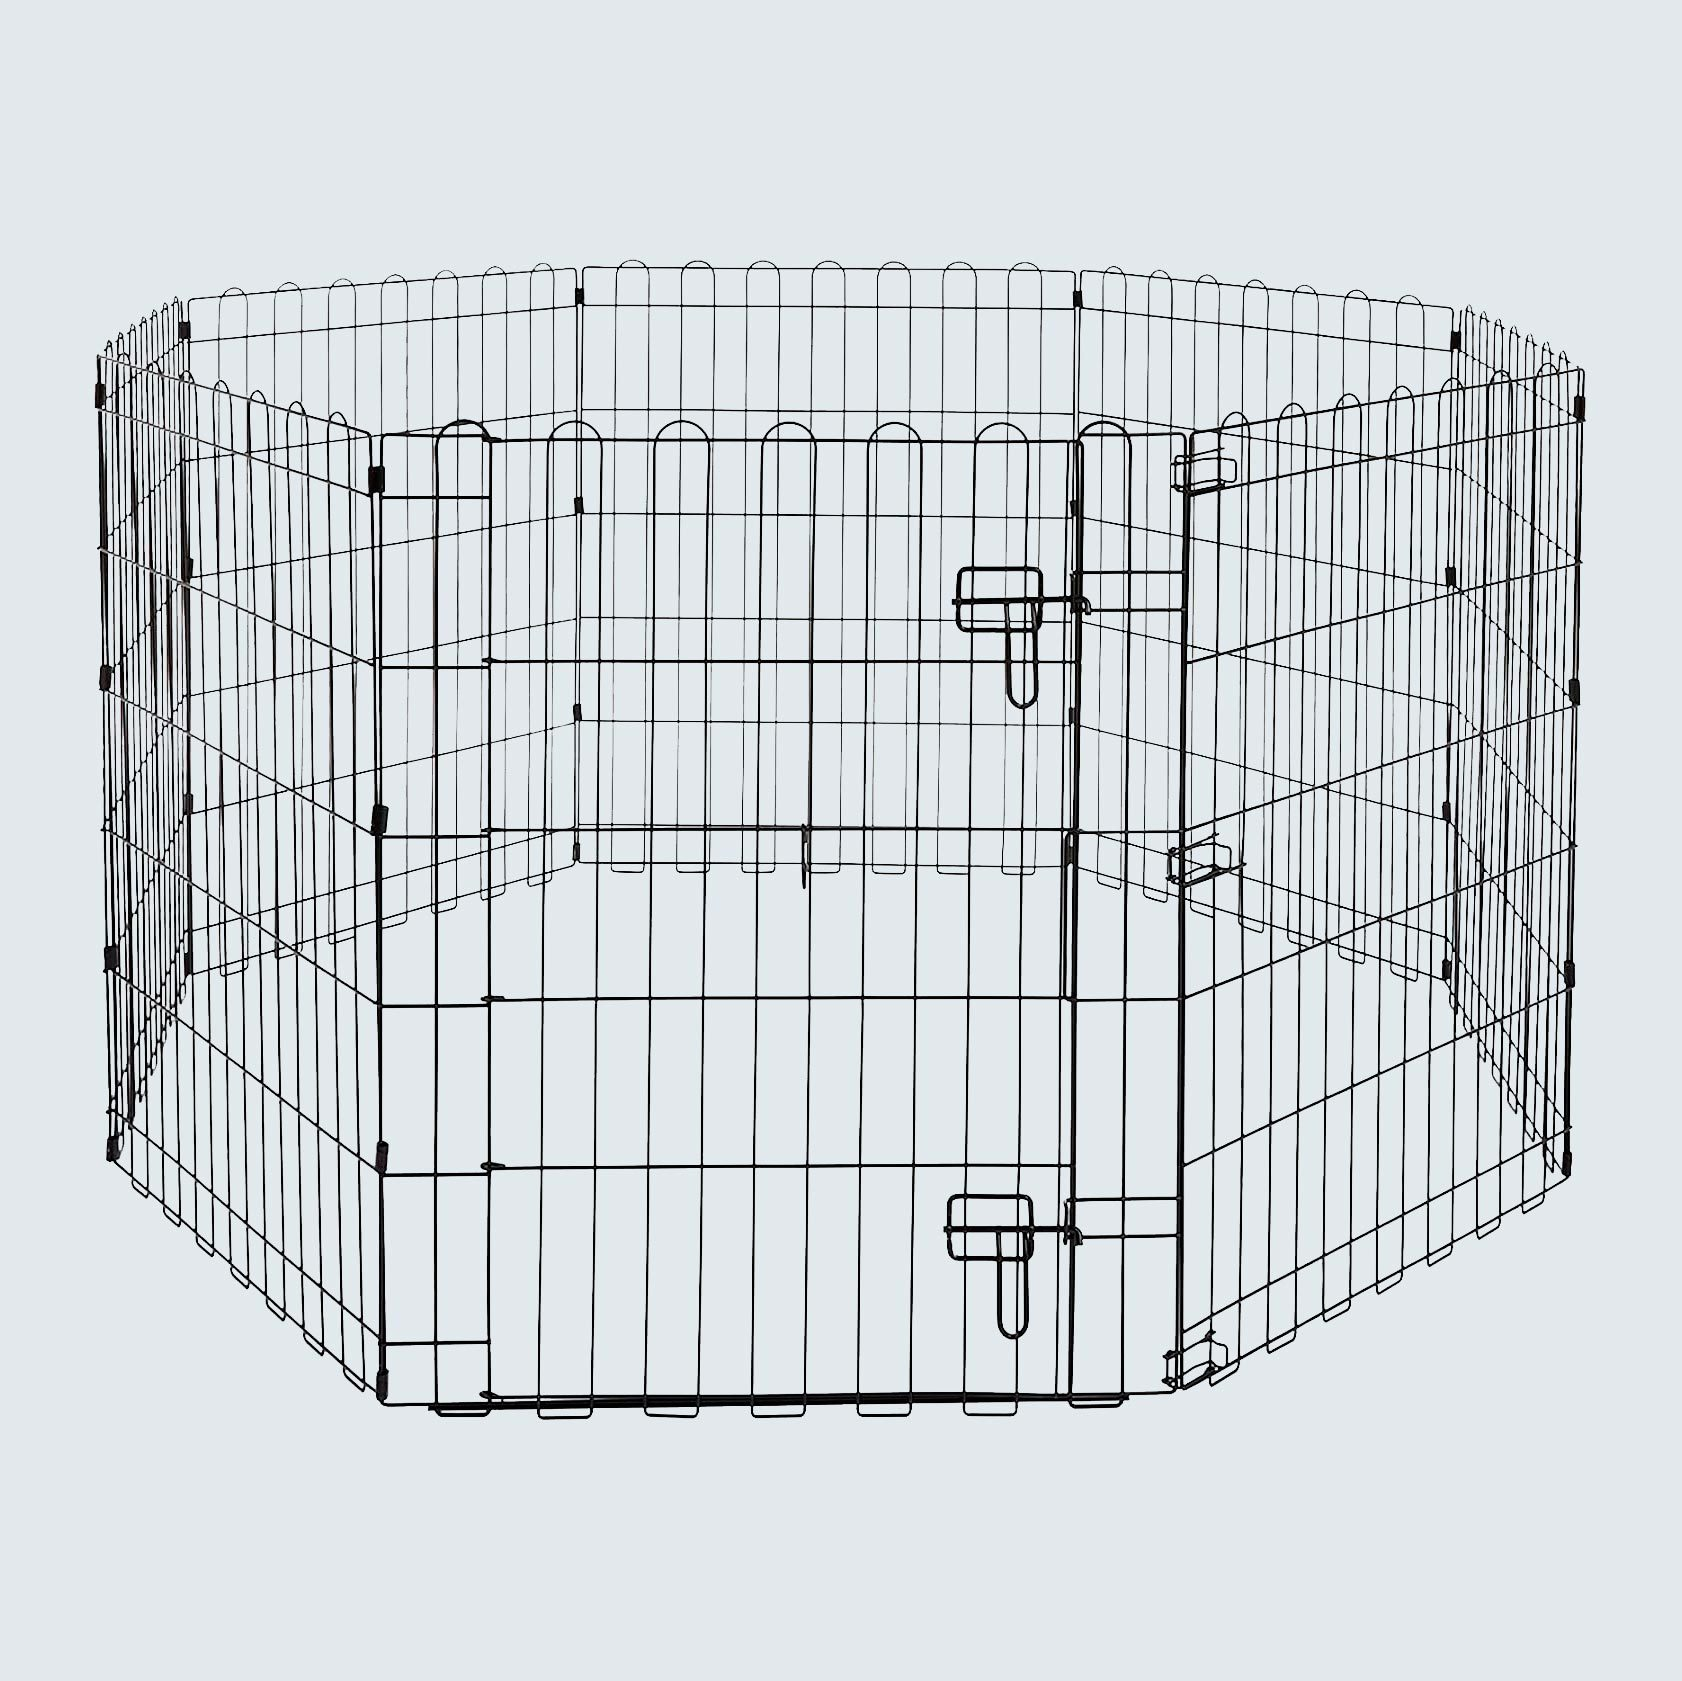 AmazonBasics Foldable Metal Pet Exercise Playpen